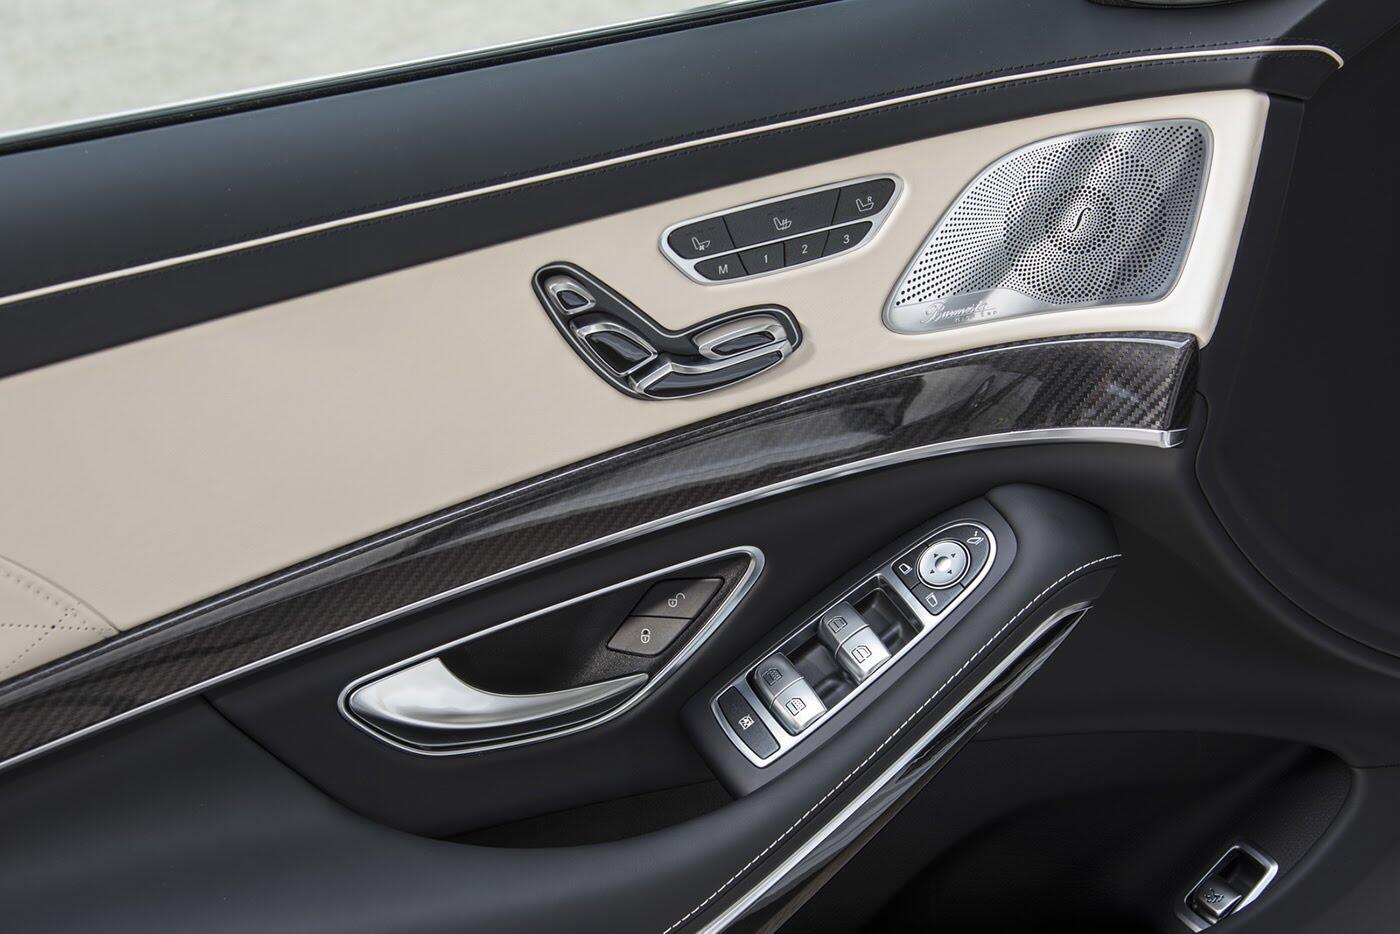 Ảnh chi tiết Mercedes-Benz S-Class 2018 - Hình 38